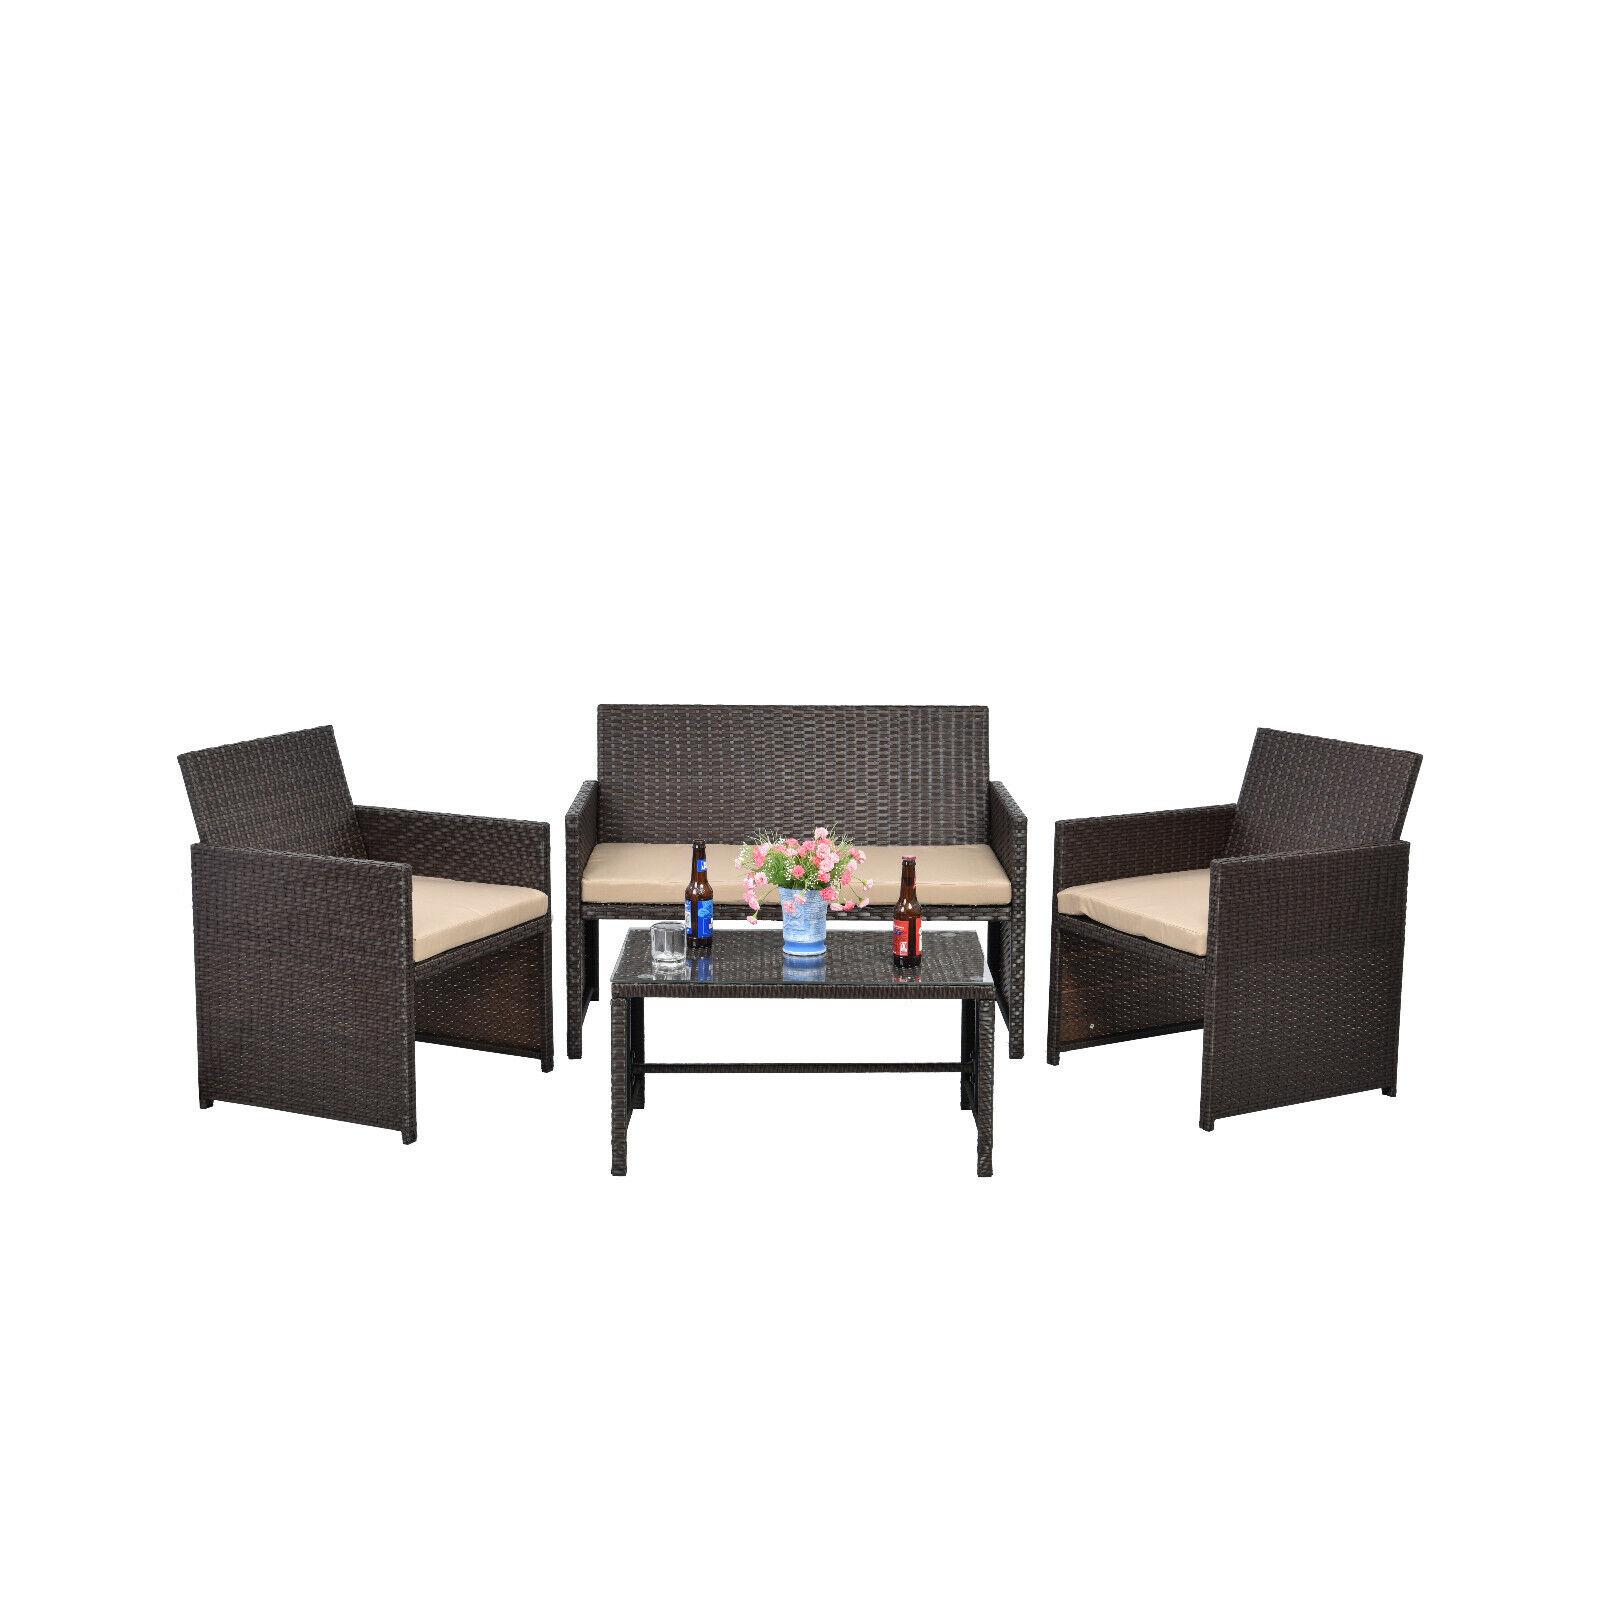 Garden Furniture - Patio Outdoor Wicker Sofa 4 PCS Furniture Garden Rattan Sectional Set Cushion